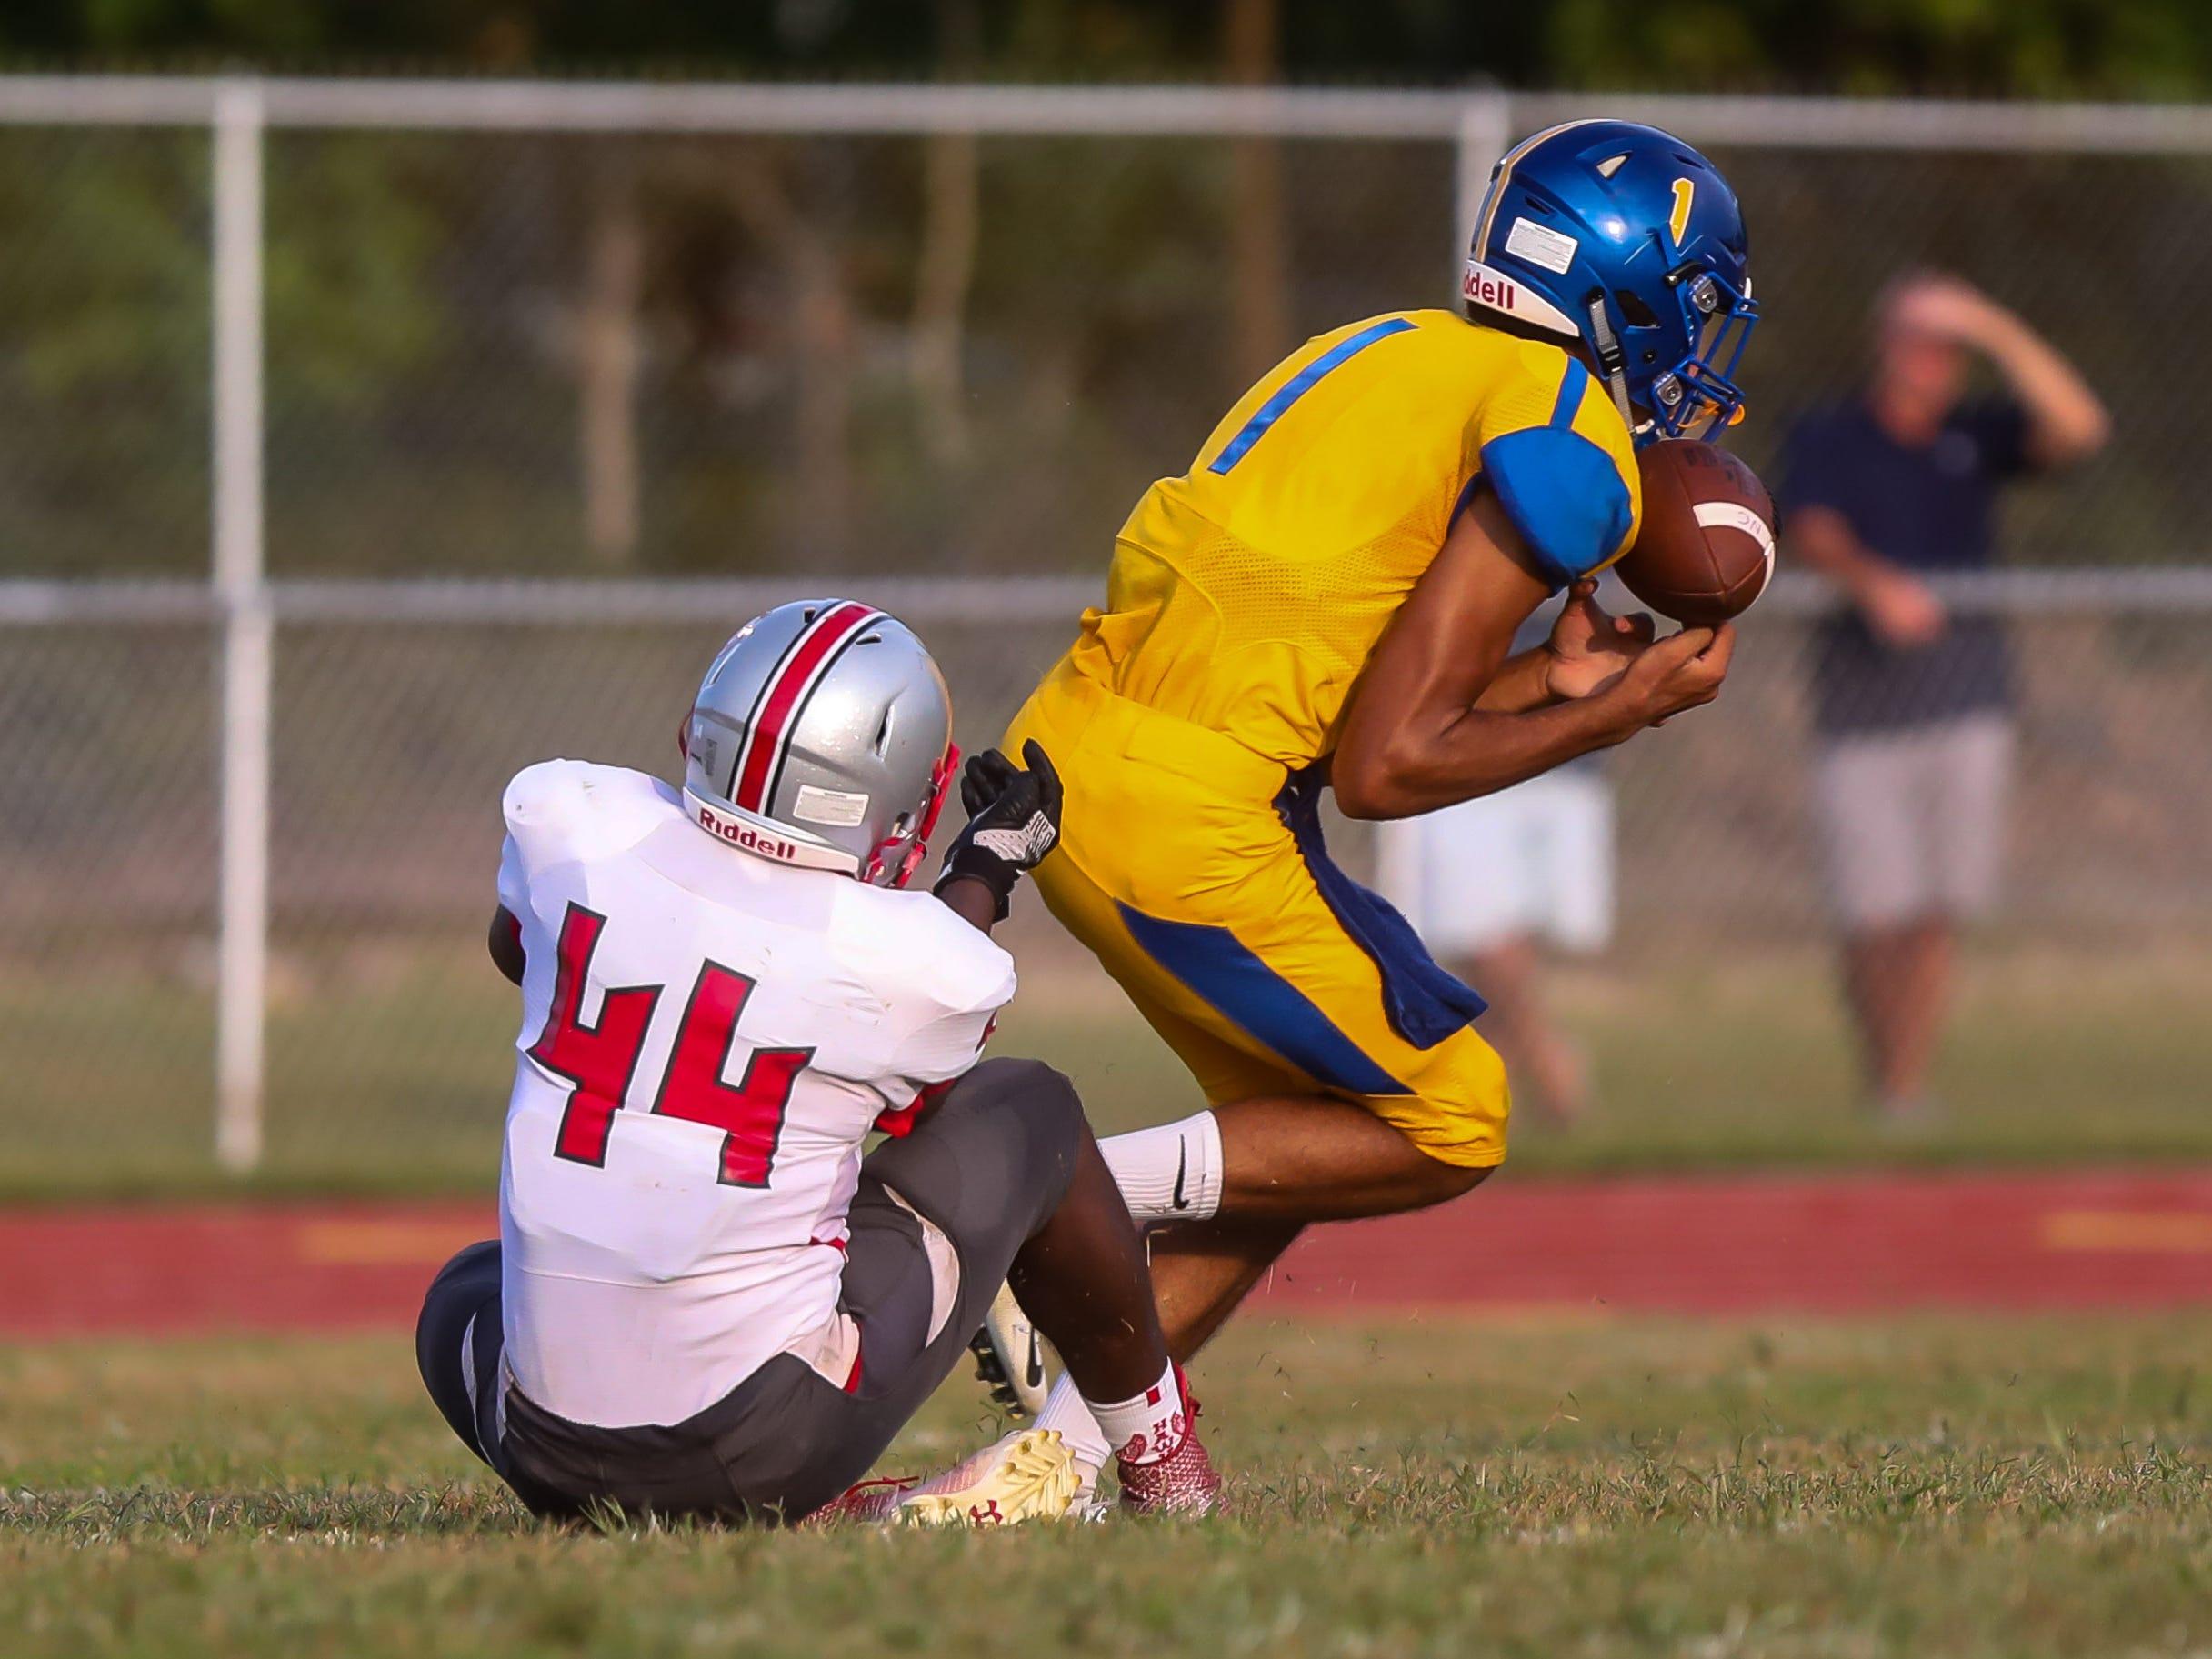 Chris Doughty of Buena intercepts the ball against Haddon Township. Buena, NJ. September 7, 2018